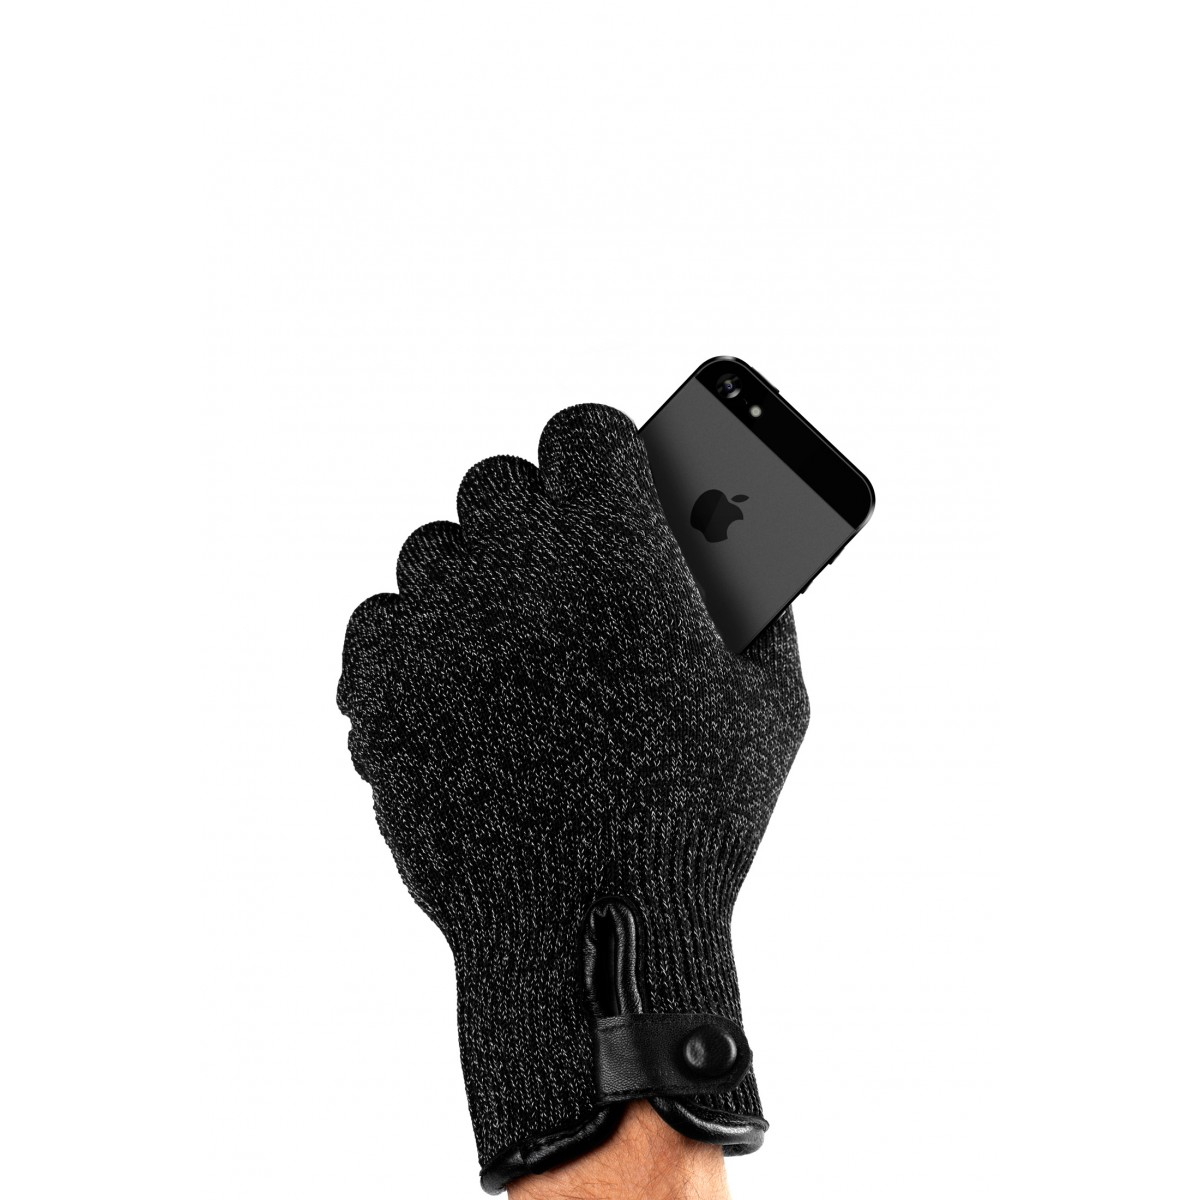 Mujjo GLKN-012-S Double-Layered Touchscreen Gloves